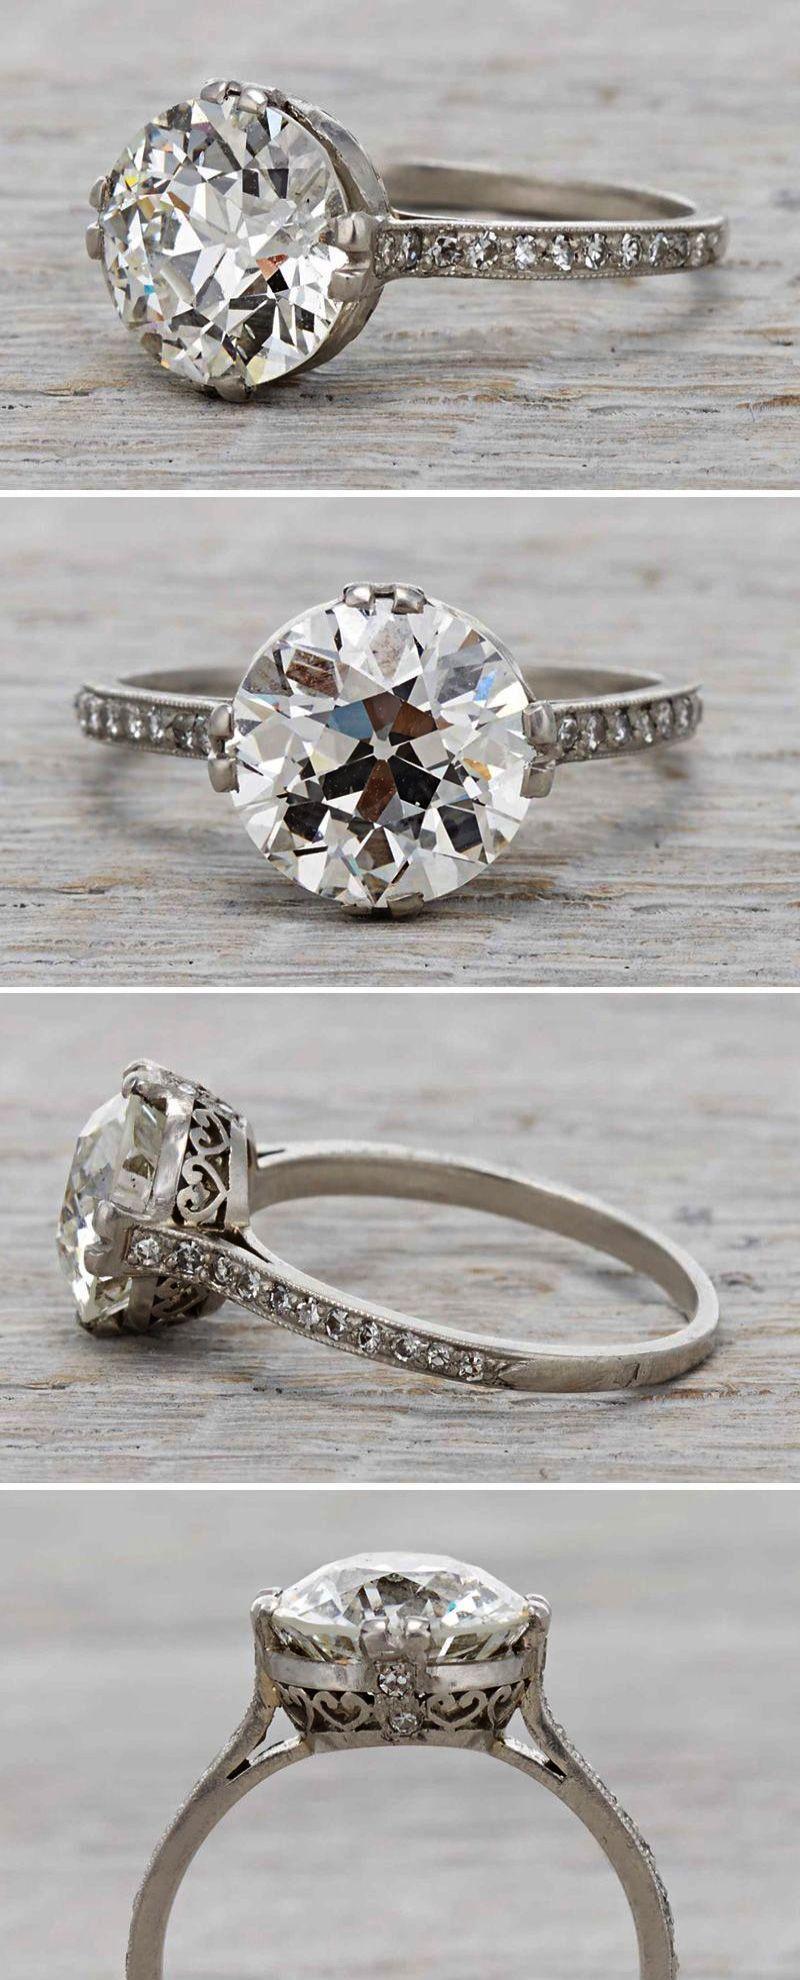 Breathtaking Antique Art Deco Engagement Rings For Sale Twitter Art Deco Engagement Ring Deco Engagement Ring Vintage Engagement Rings